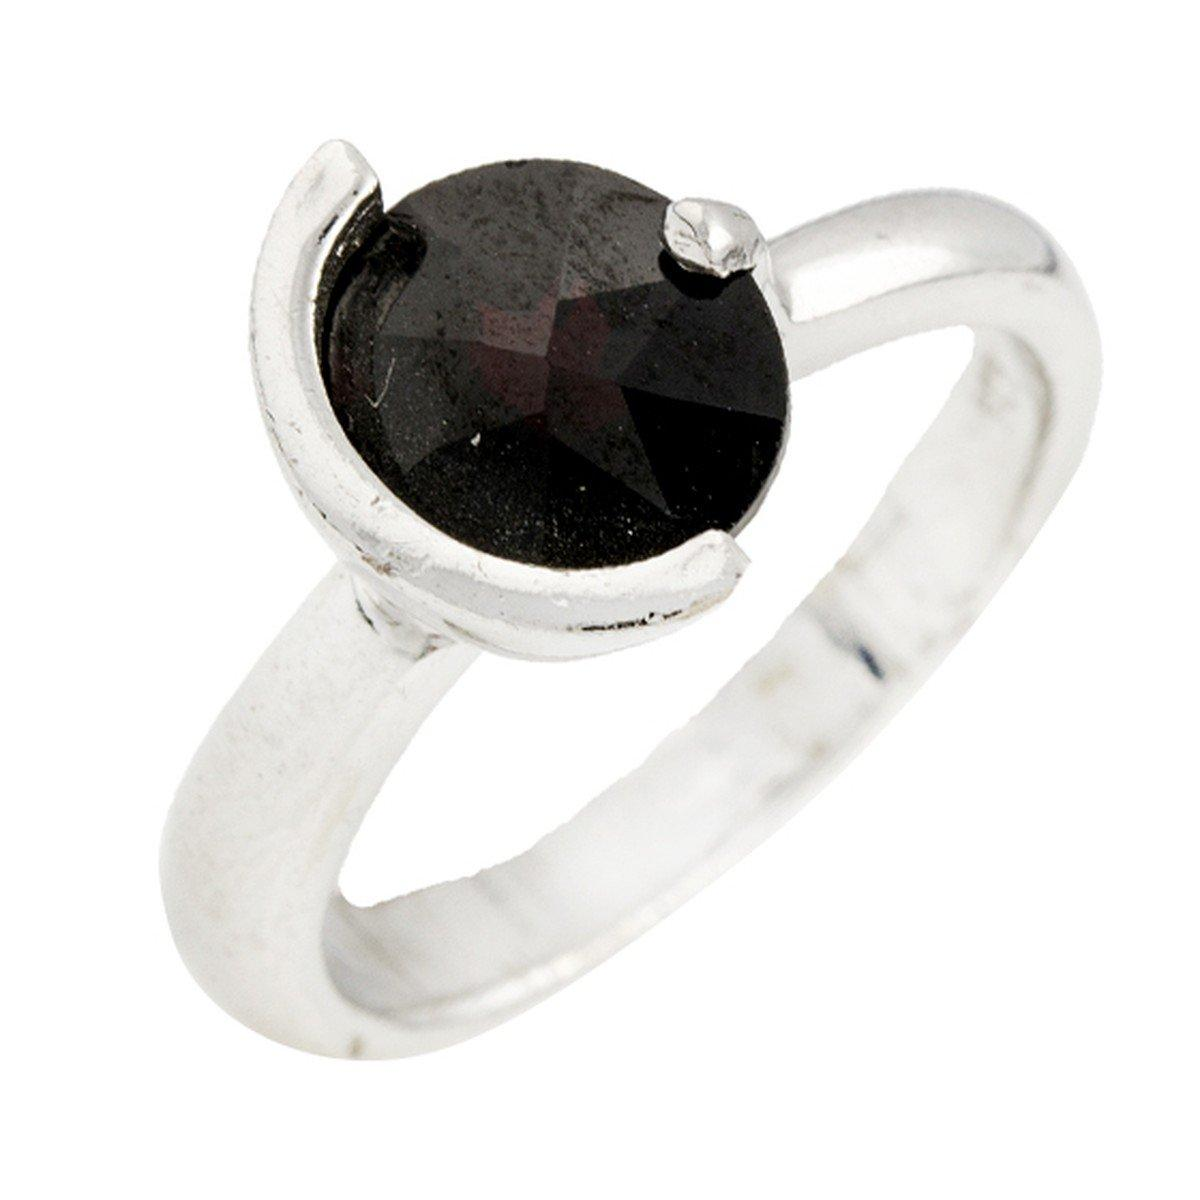 Серебряное кольцо DreamJewelry с натуральным гранатом (0077727) 17.5 размер